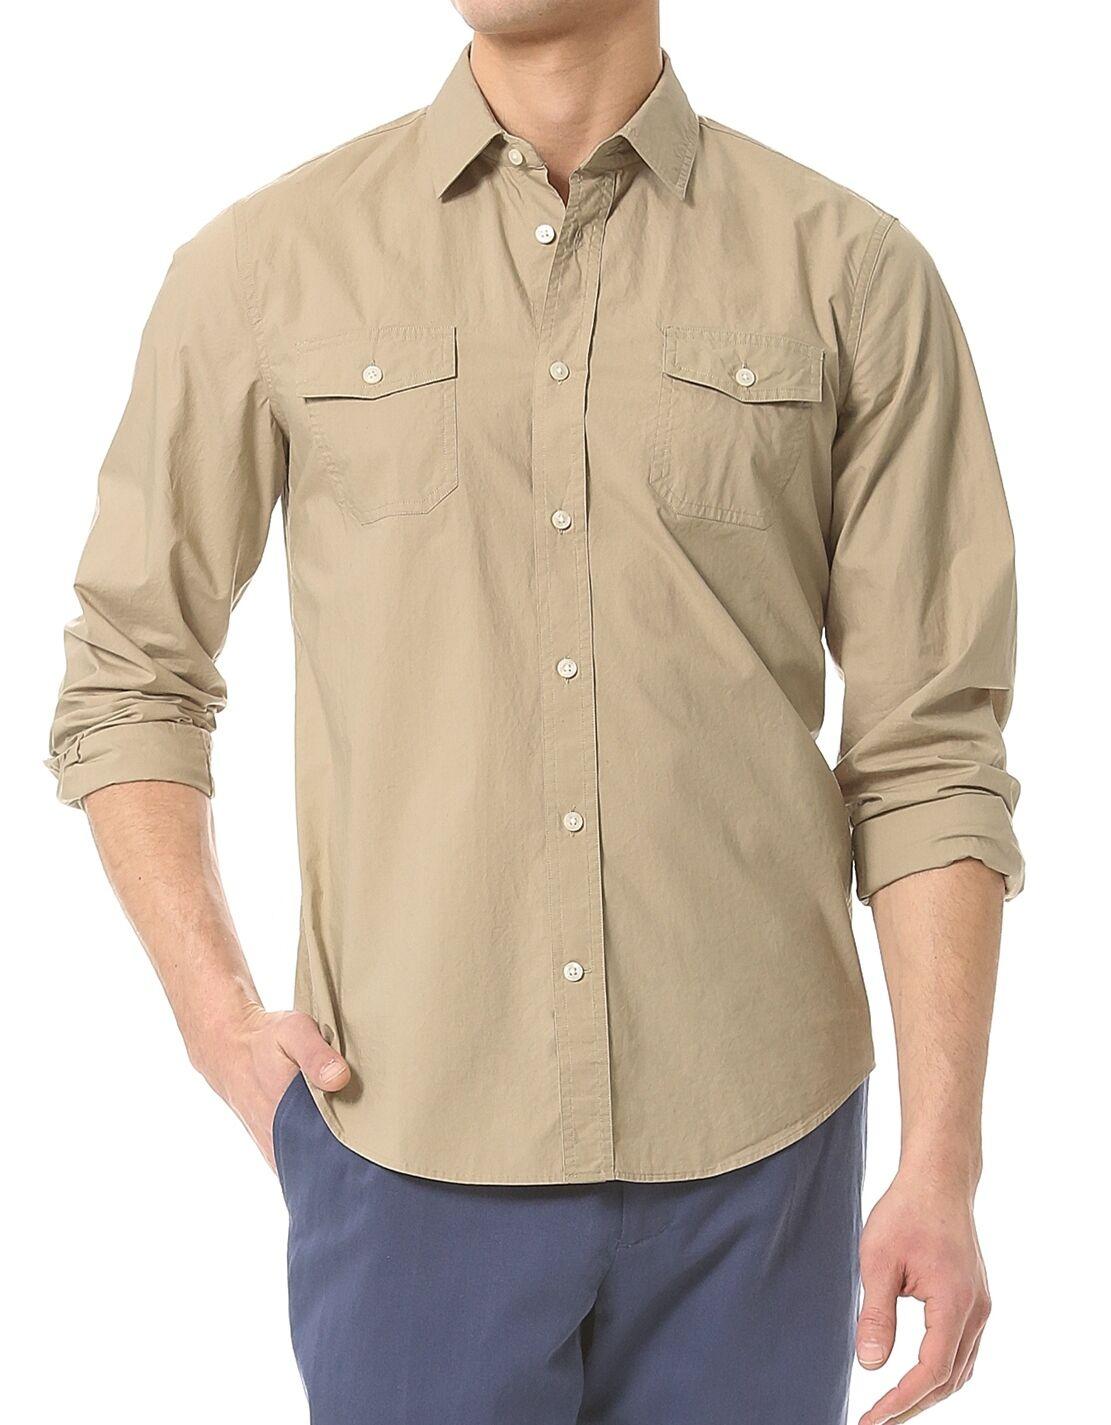 Nwt  VINCE Slim Fit Solid Parachute Sport Shirt Top Maple Beige S